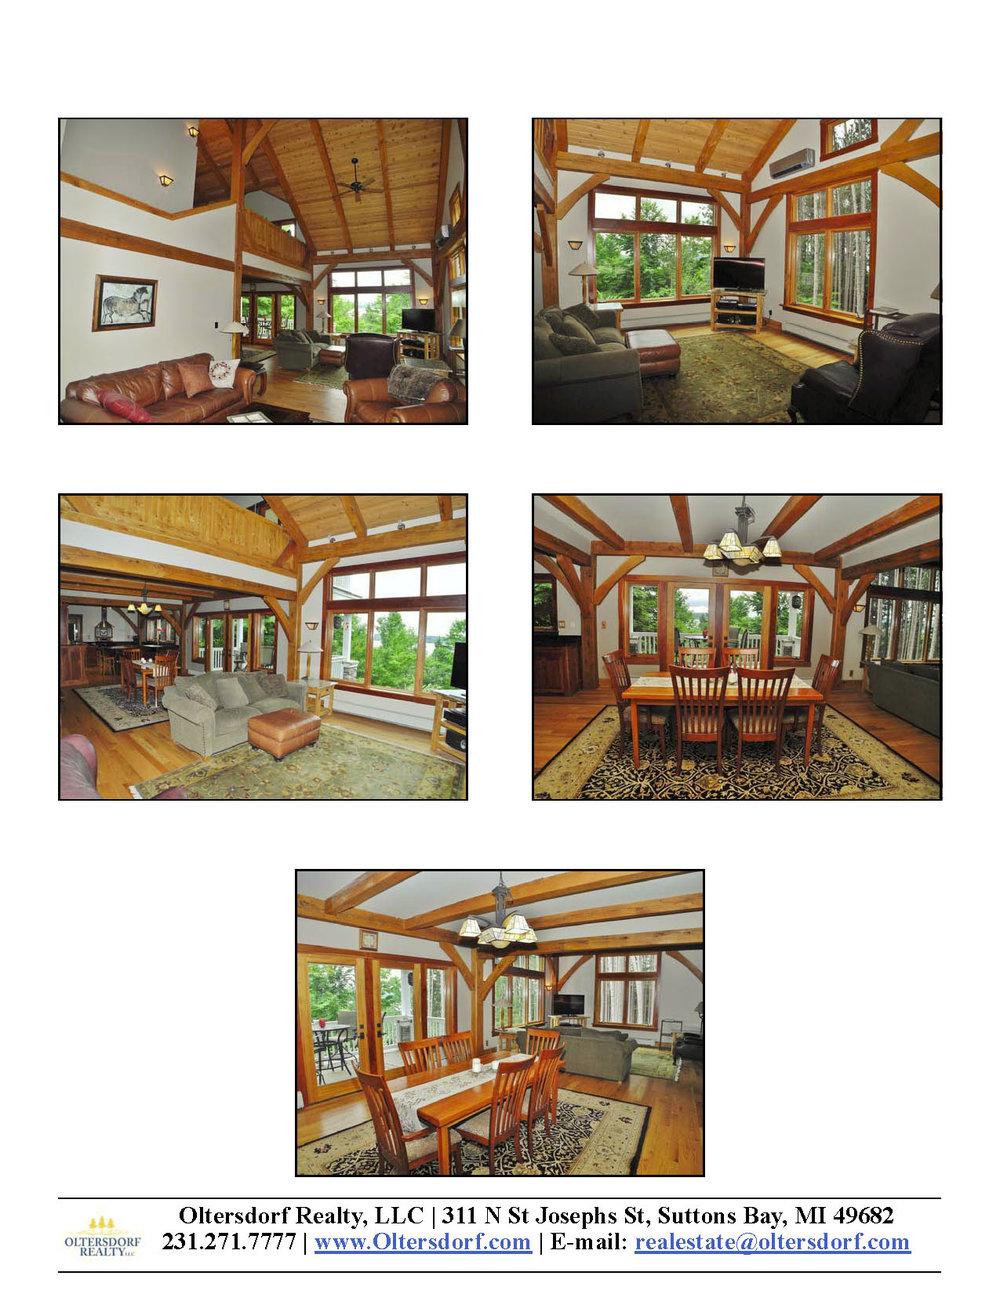 5500 E Hidden Beech, Cedar, MI - For sale by Oltersdorf Realty LLC - Marketing Packet (5).jpg